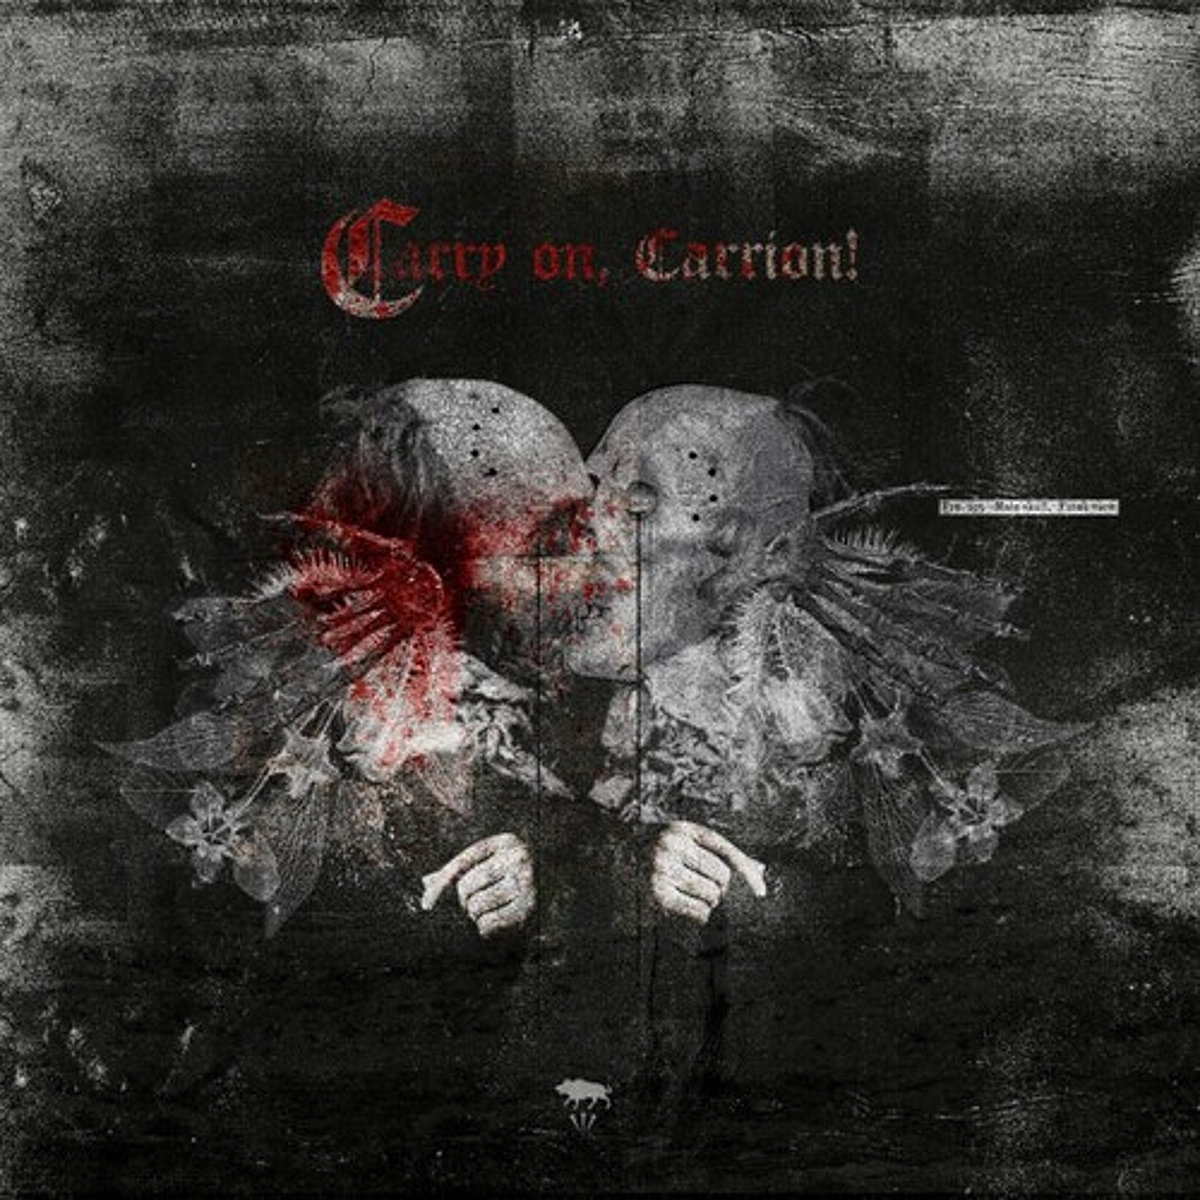 Carry On Carrion Ayat Moribund Records